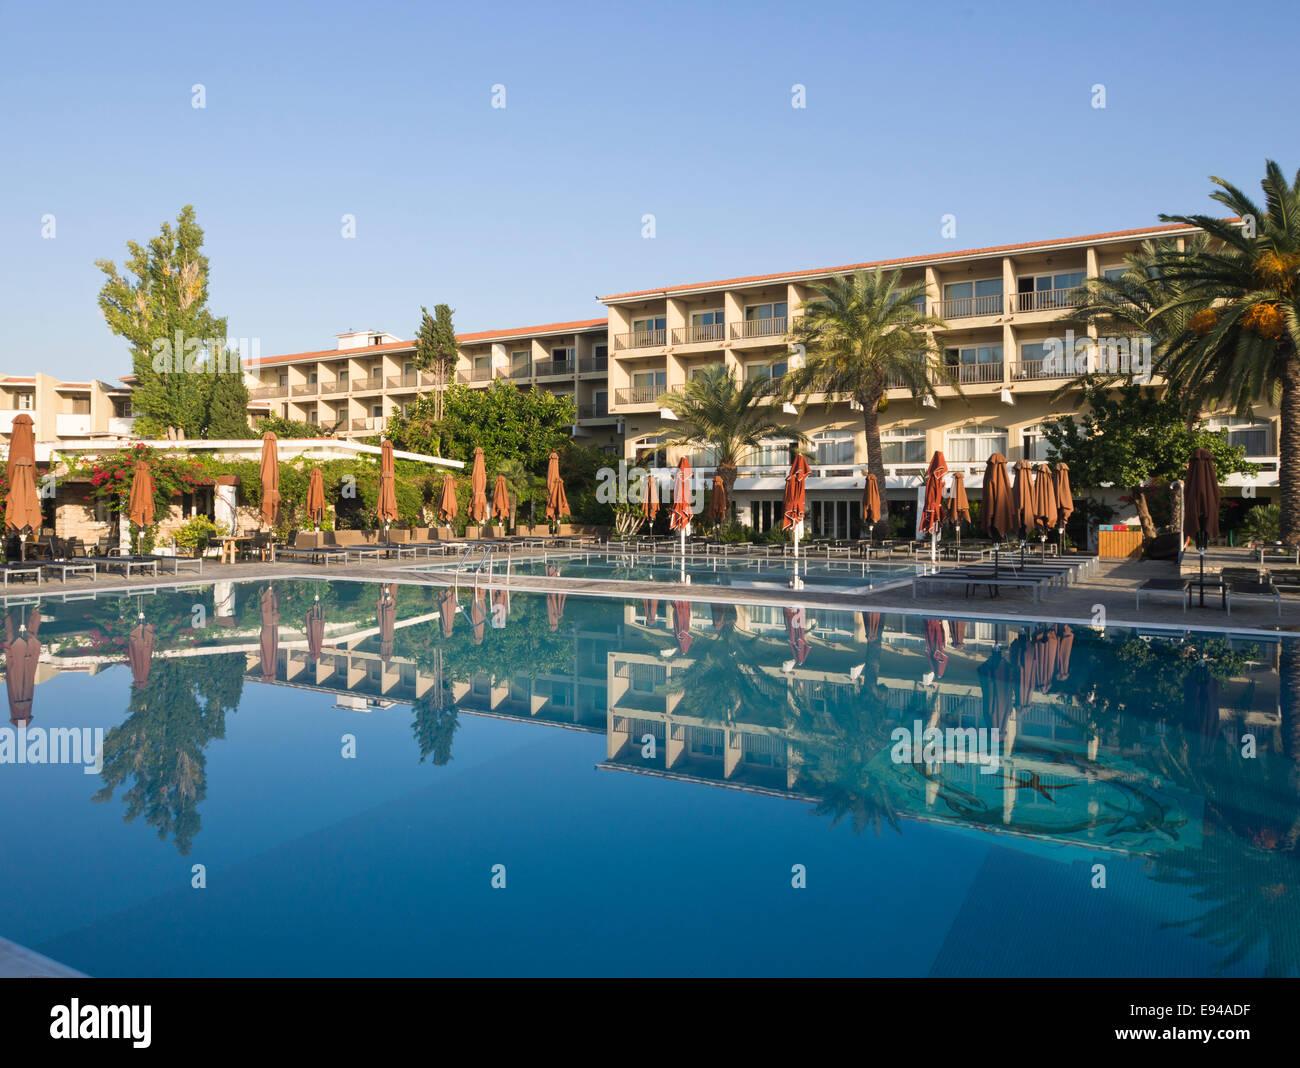 Doryssa seaside resort, hotel in Phytagorion Samos island Greece - Stock Image